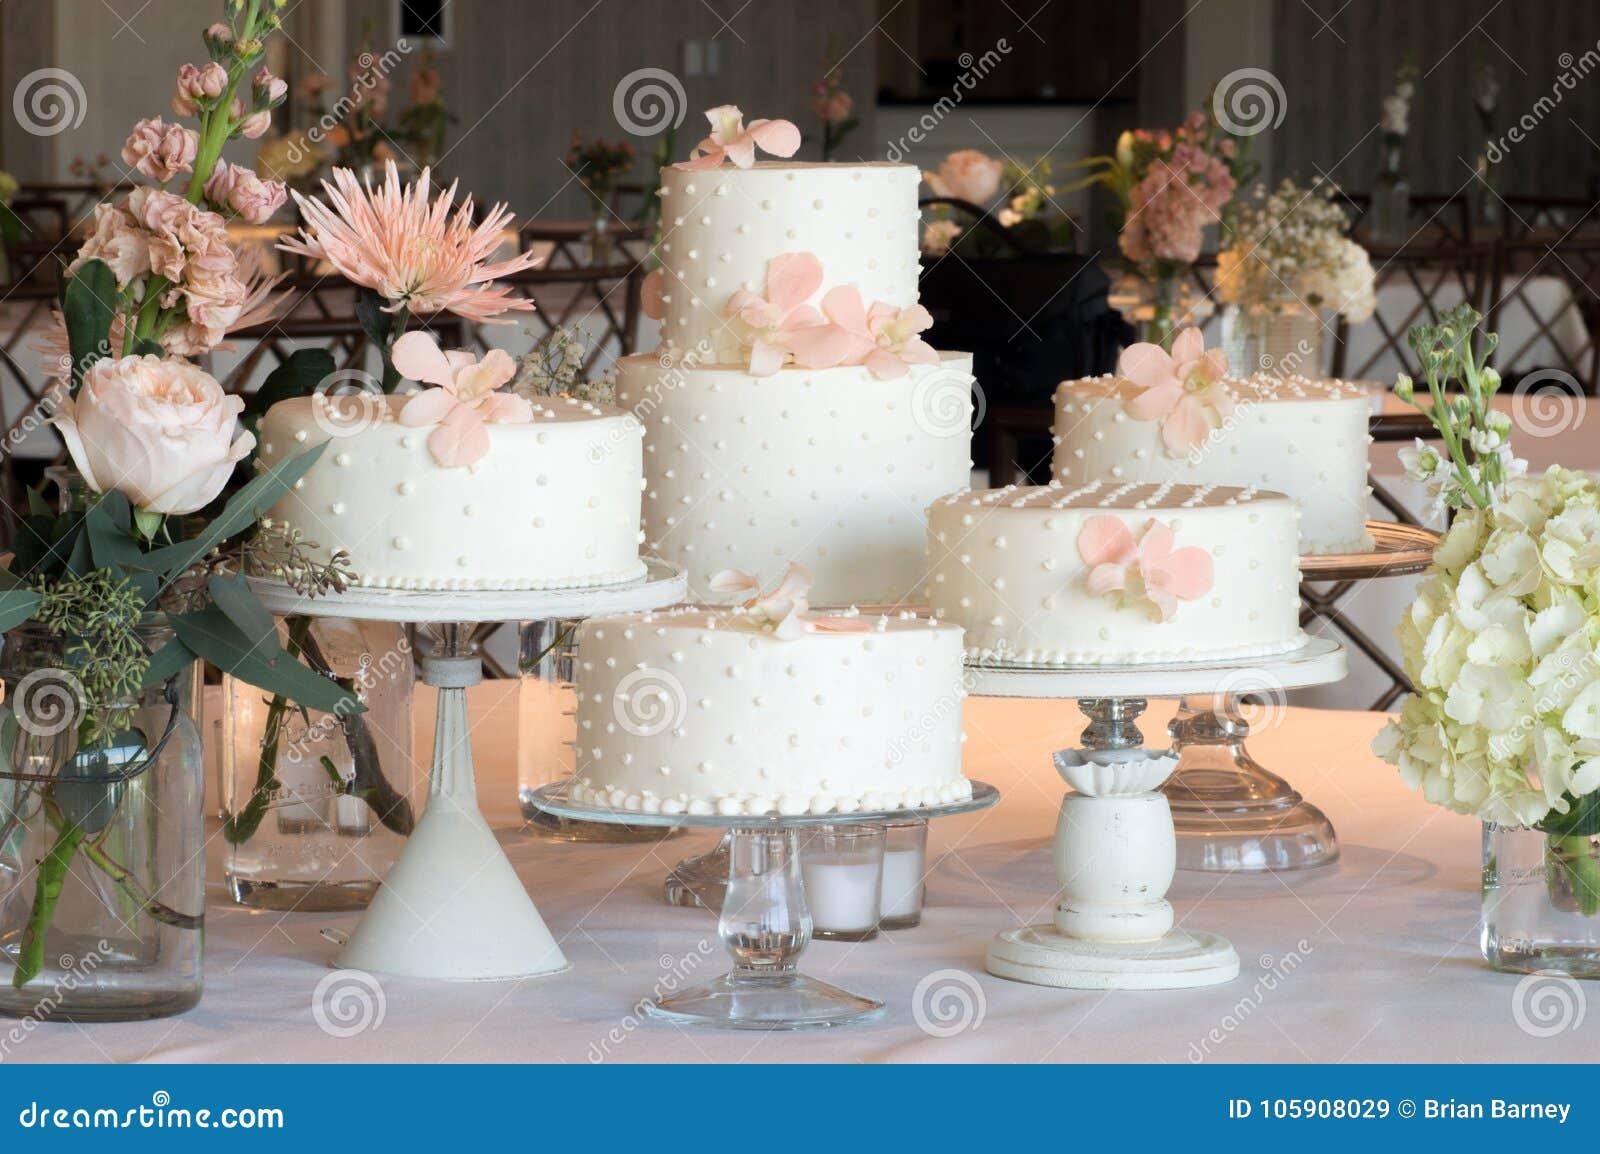 Polka Dot Wedding Cake Arrangement Stock Image Image Of Flowers Assortment 105908029